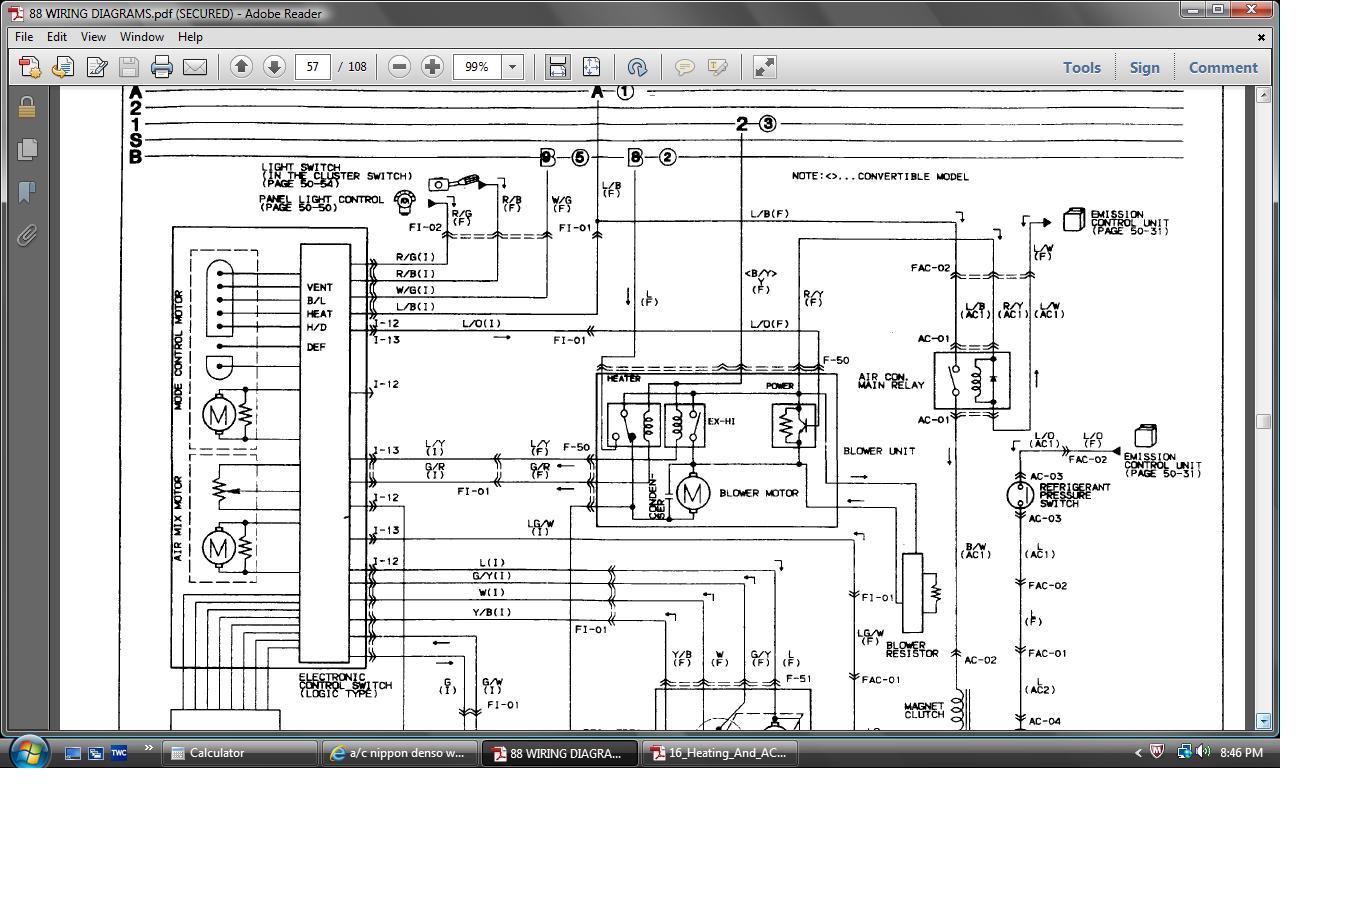 5 Wire Relay Wiring Diagram For Door Lock A C Nippon Denso Wiring Diagram Rx7club Com Mazda Rx7